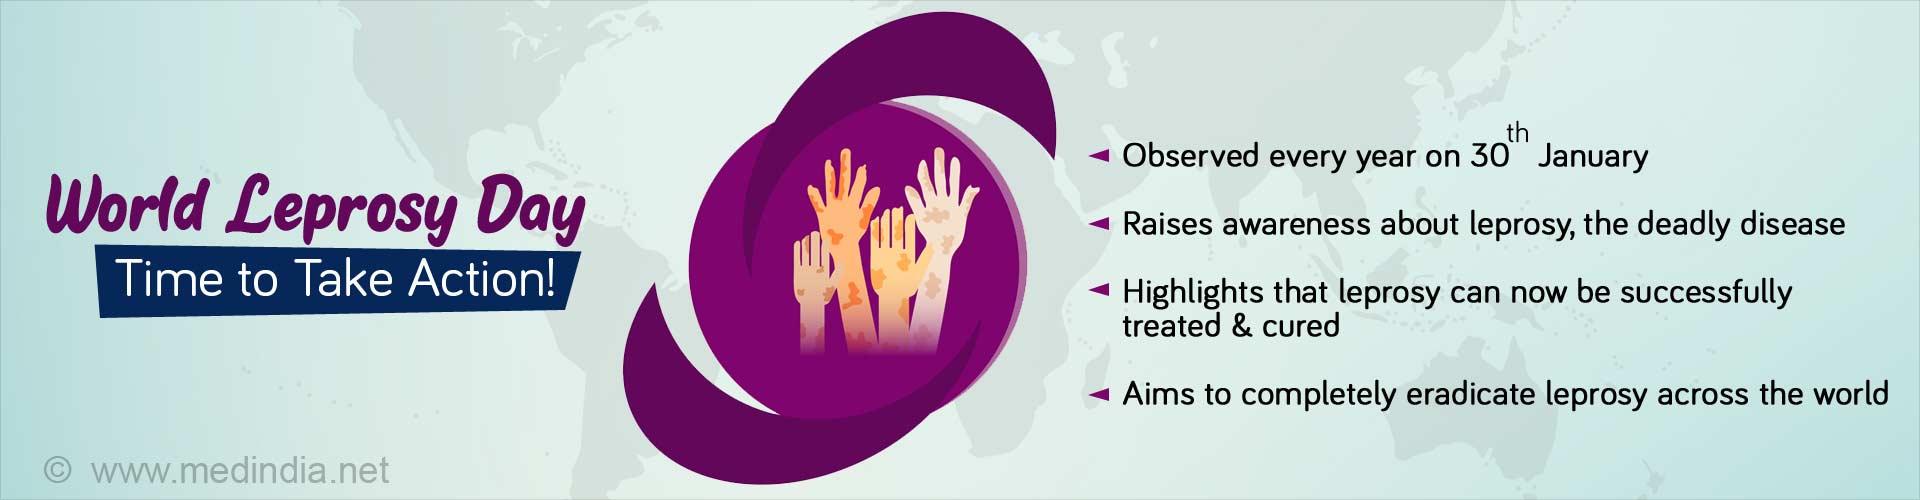 World Leprosy Day: Let's Stop Stigma & Discrimination